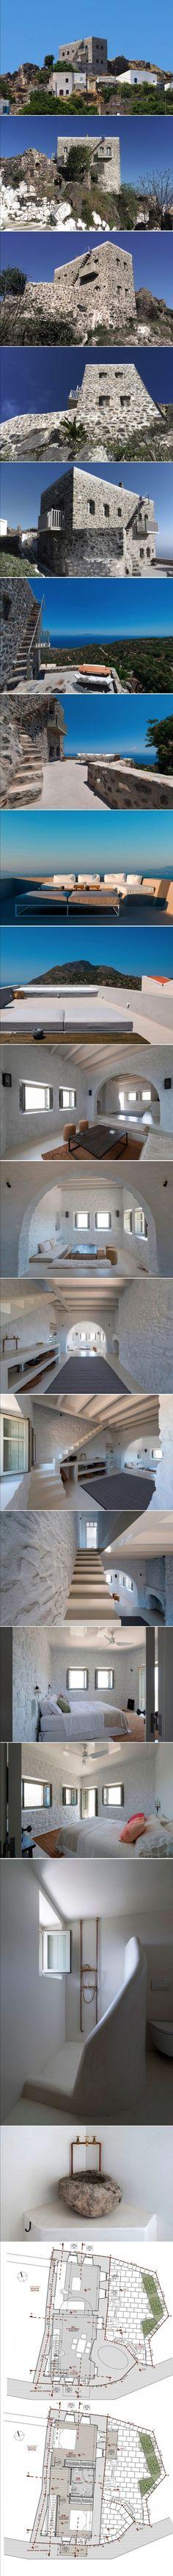 Sterna Nisyros Residence by i.landarchitects & Dolihos architects